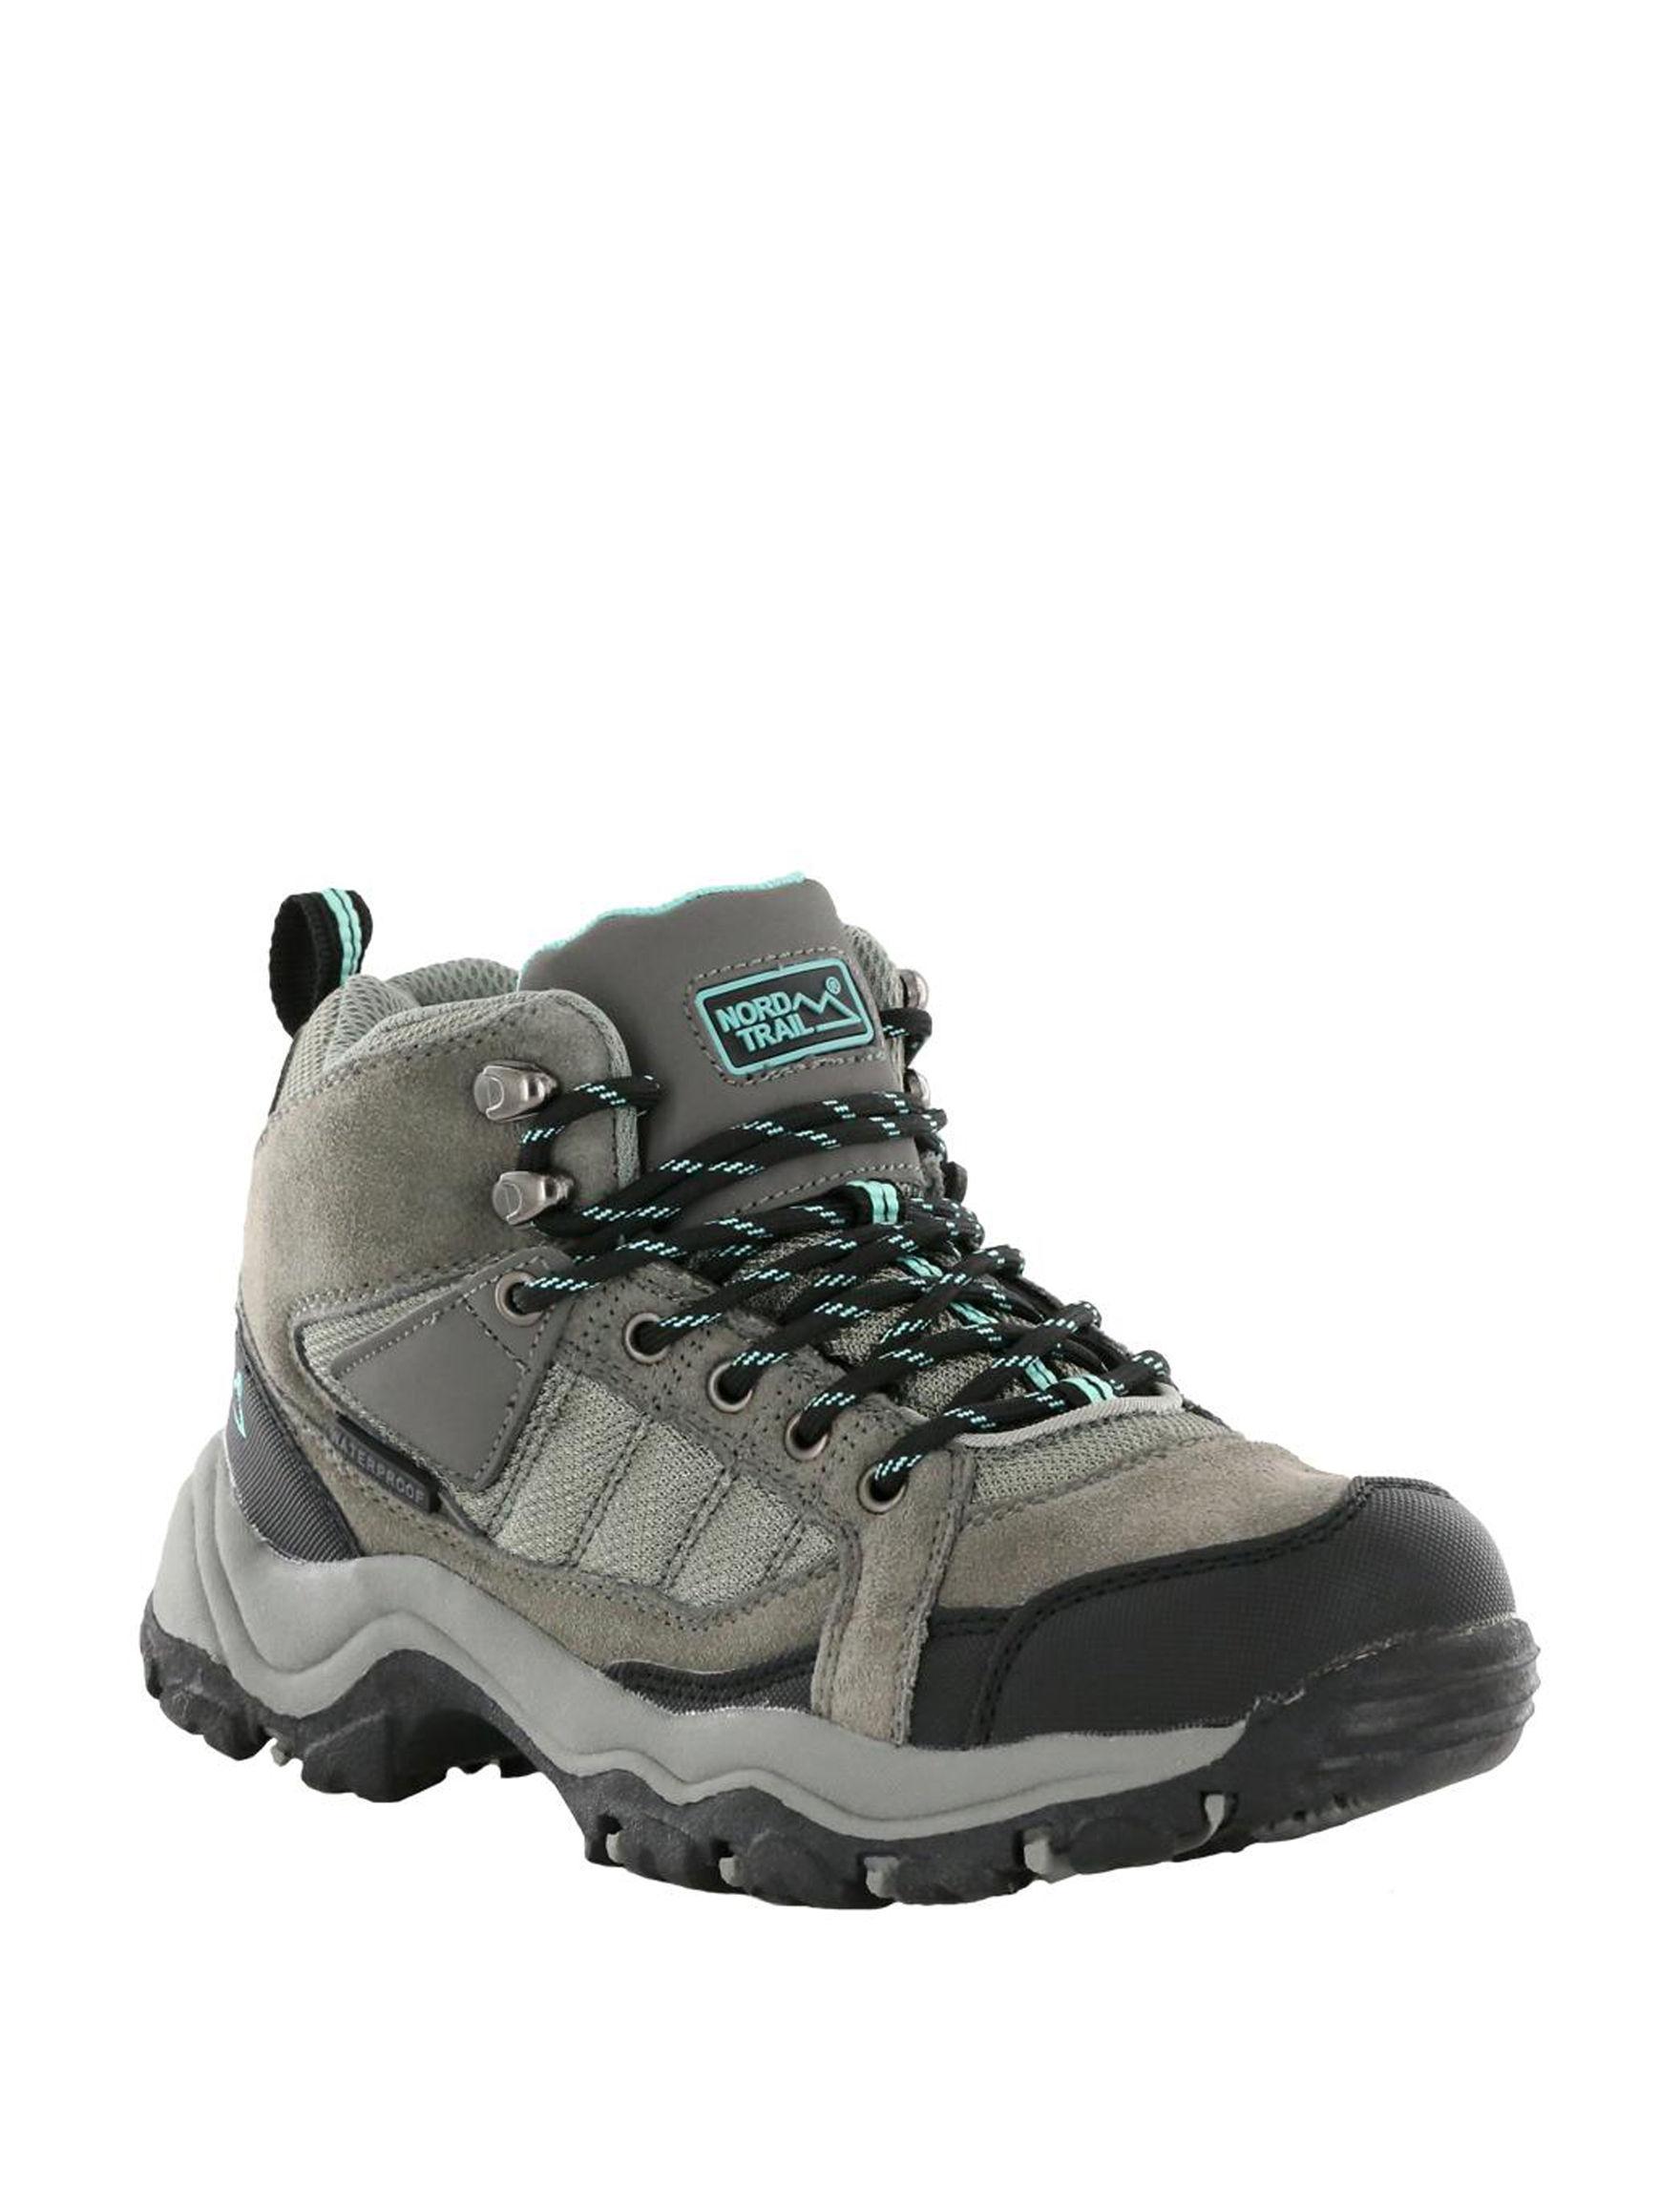 Nord Trail Dark Grey Hiking Boots